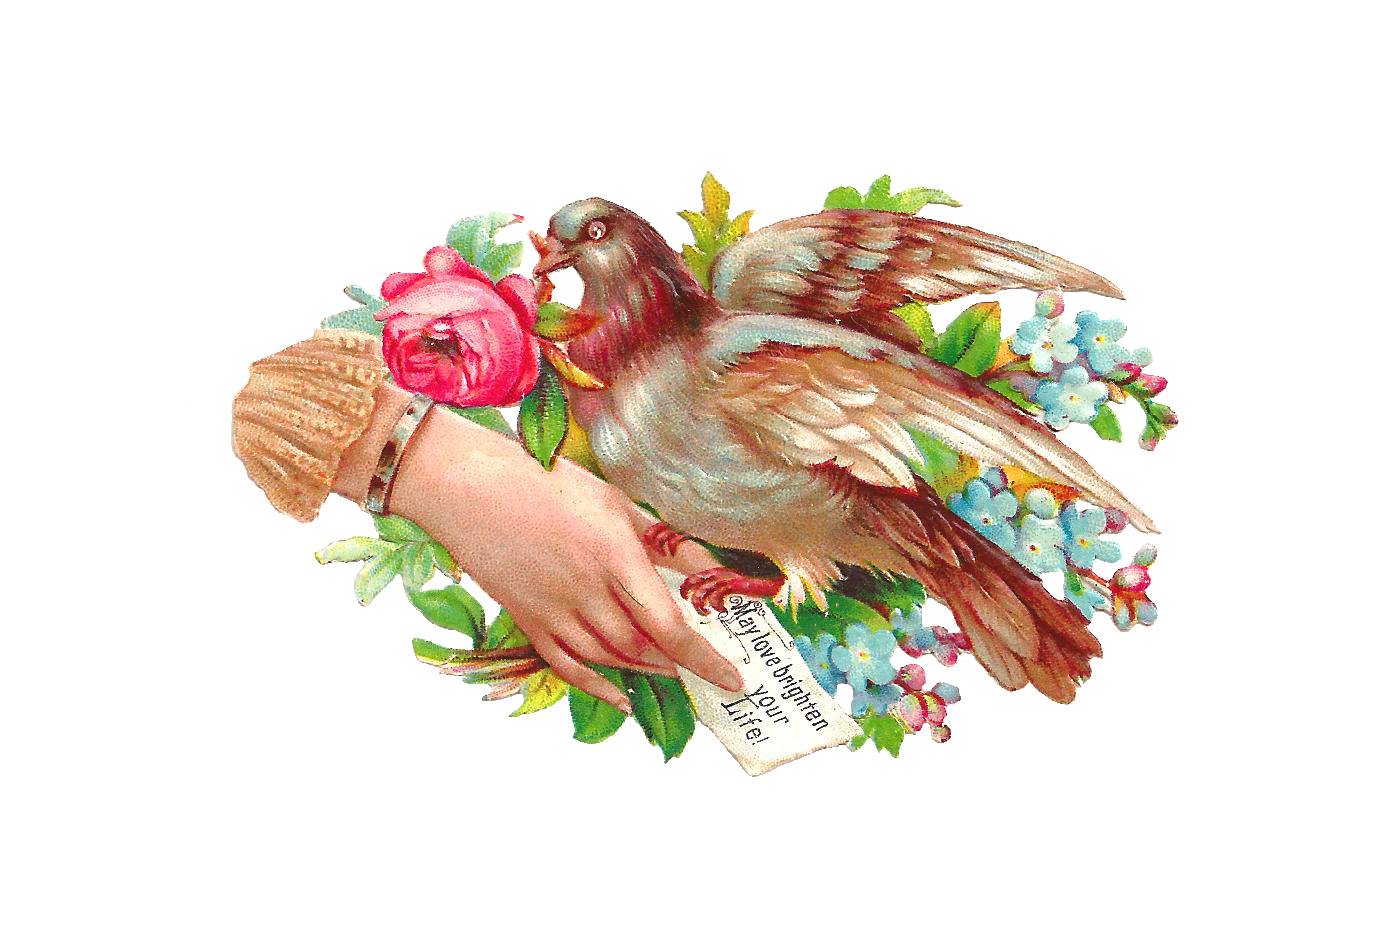 Victorian flower clipart graphic download Clip Art Designs, Vector Clip Art Graghic: March 2013 graphic download